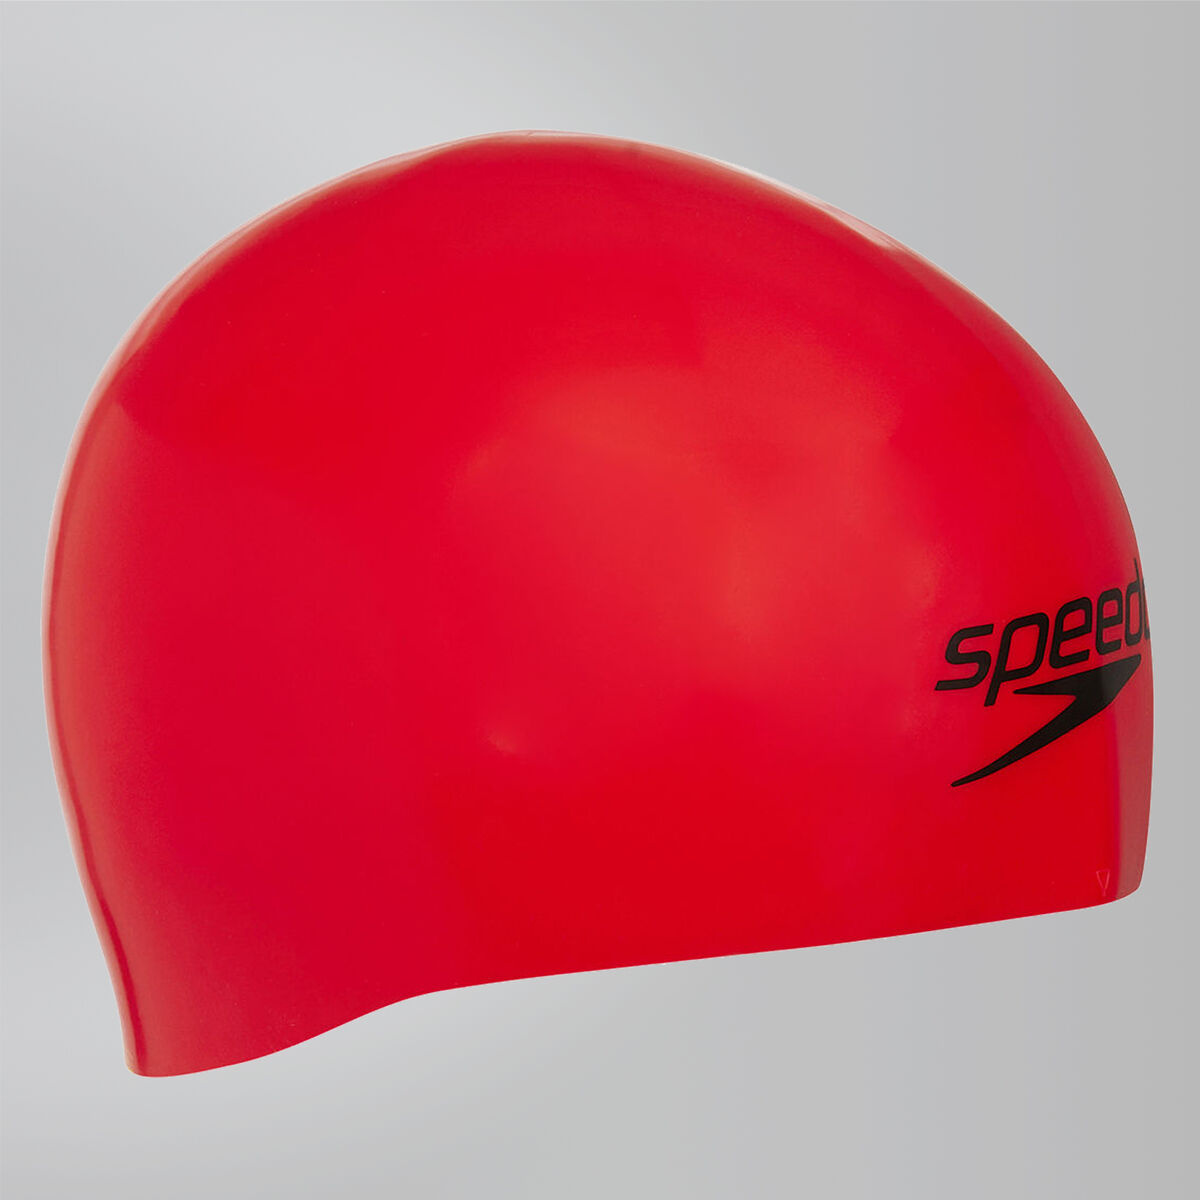 Fastskin Swim Cap